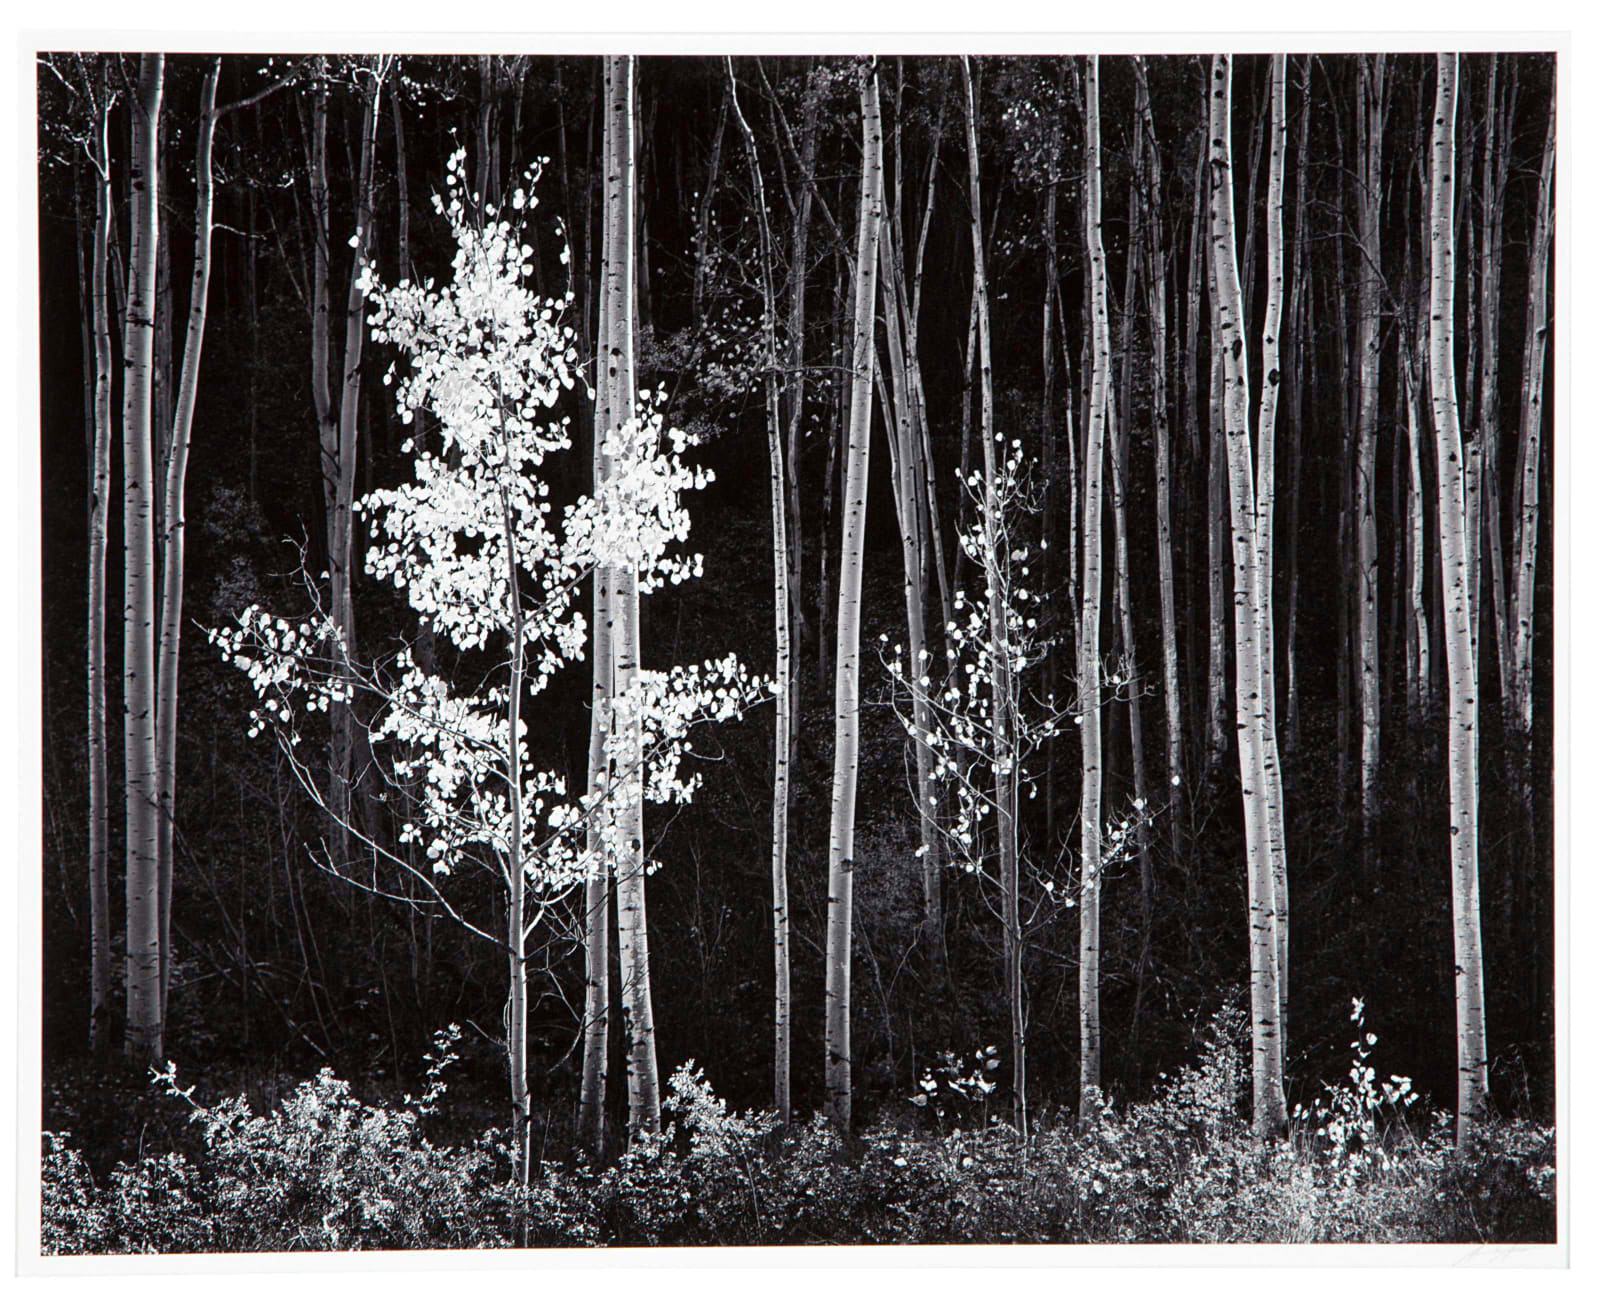 Ansel Adams, Aspens, Northern New Mexico, 1958 (Printed 1976)